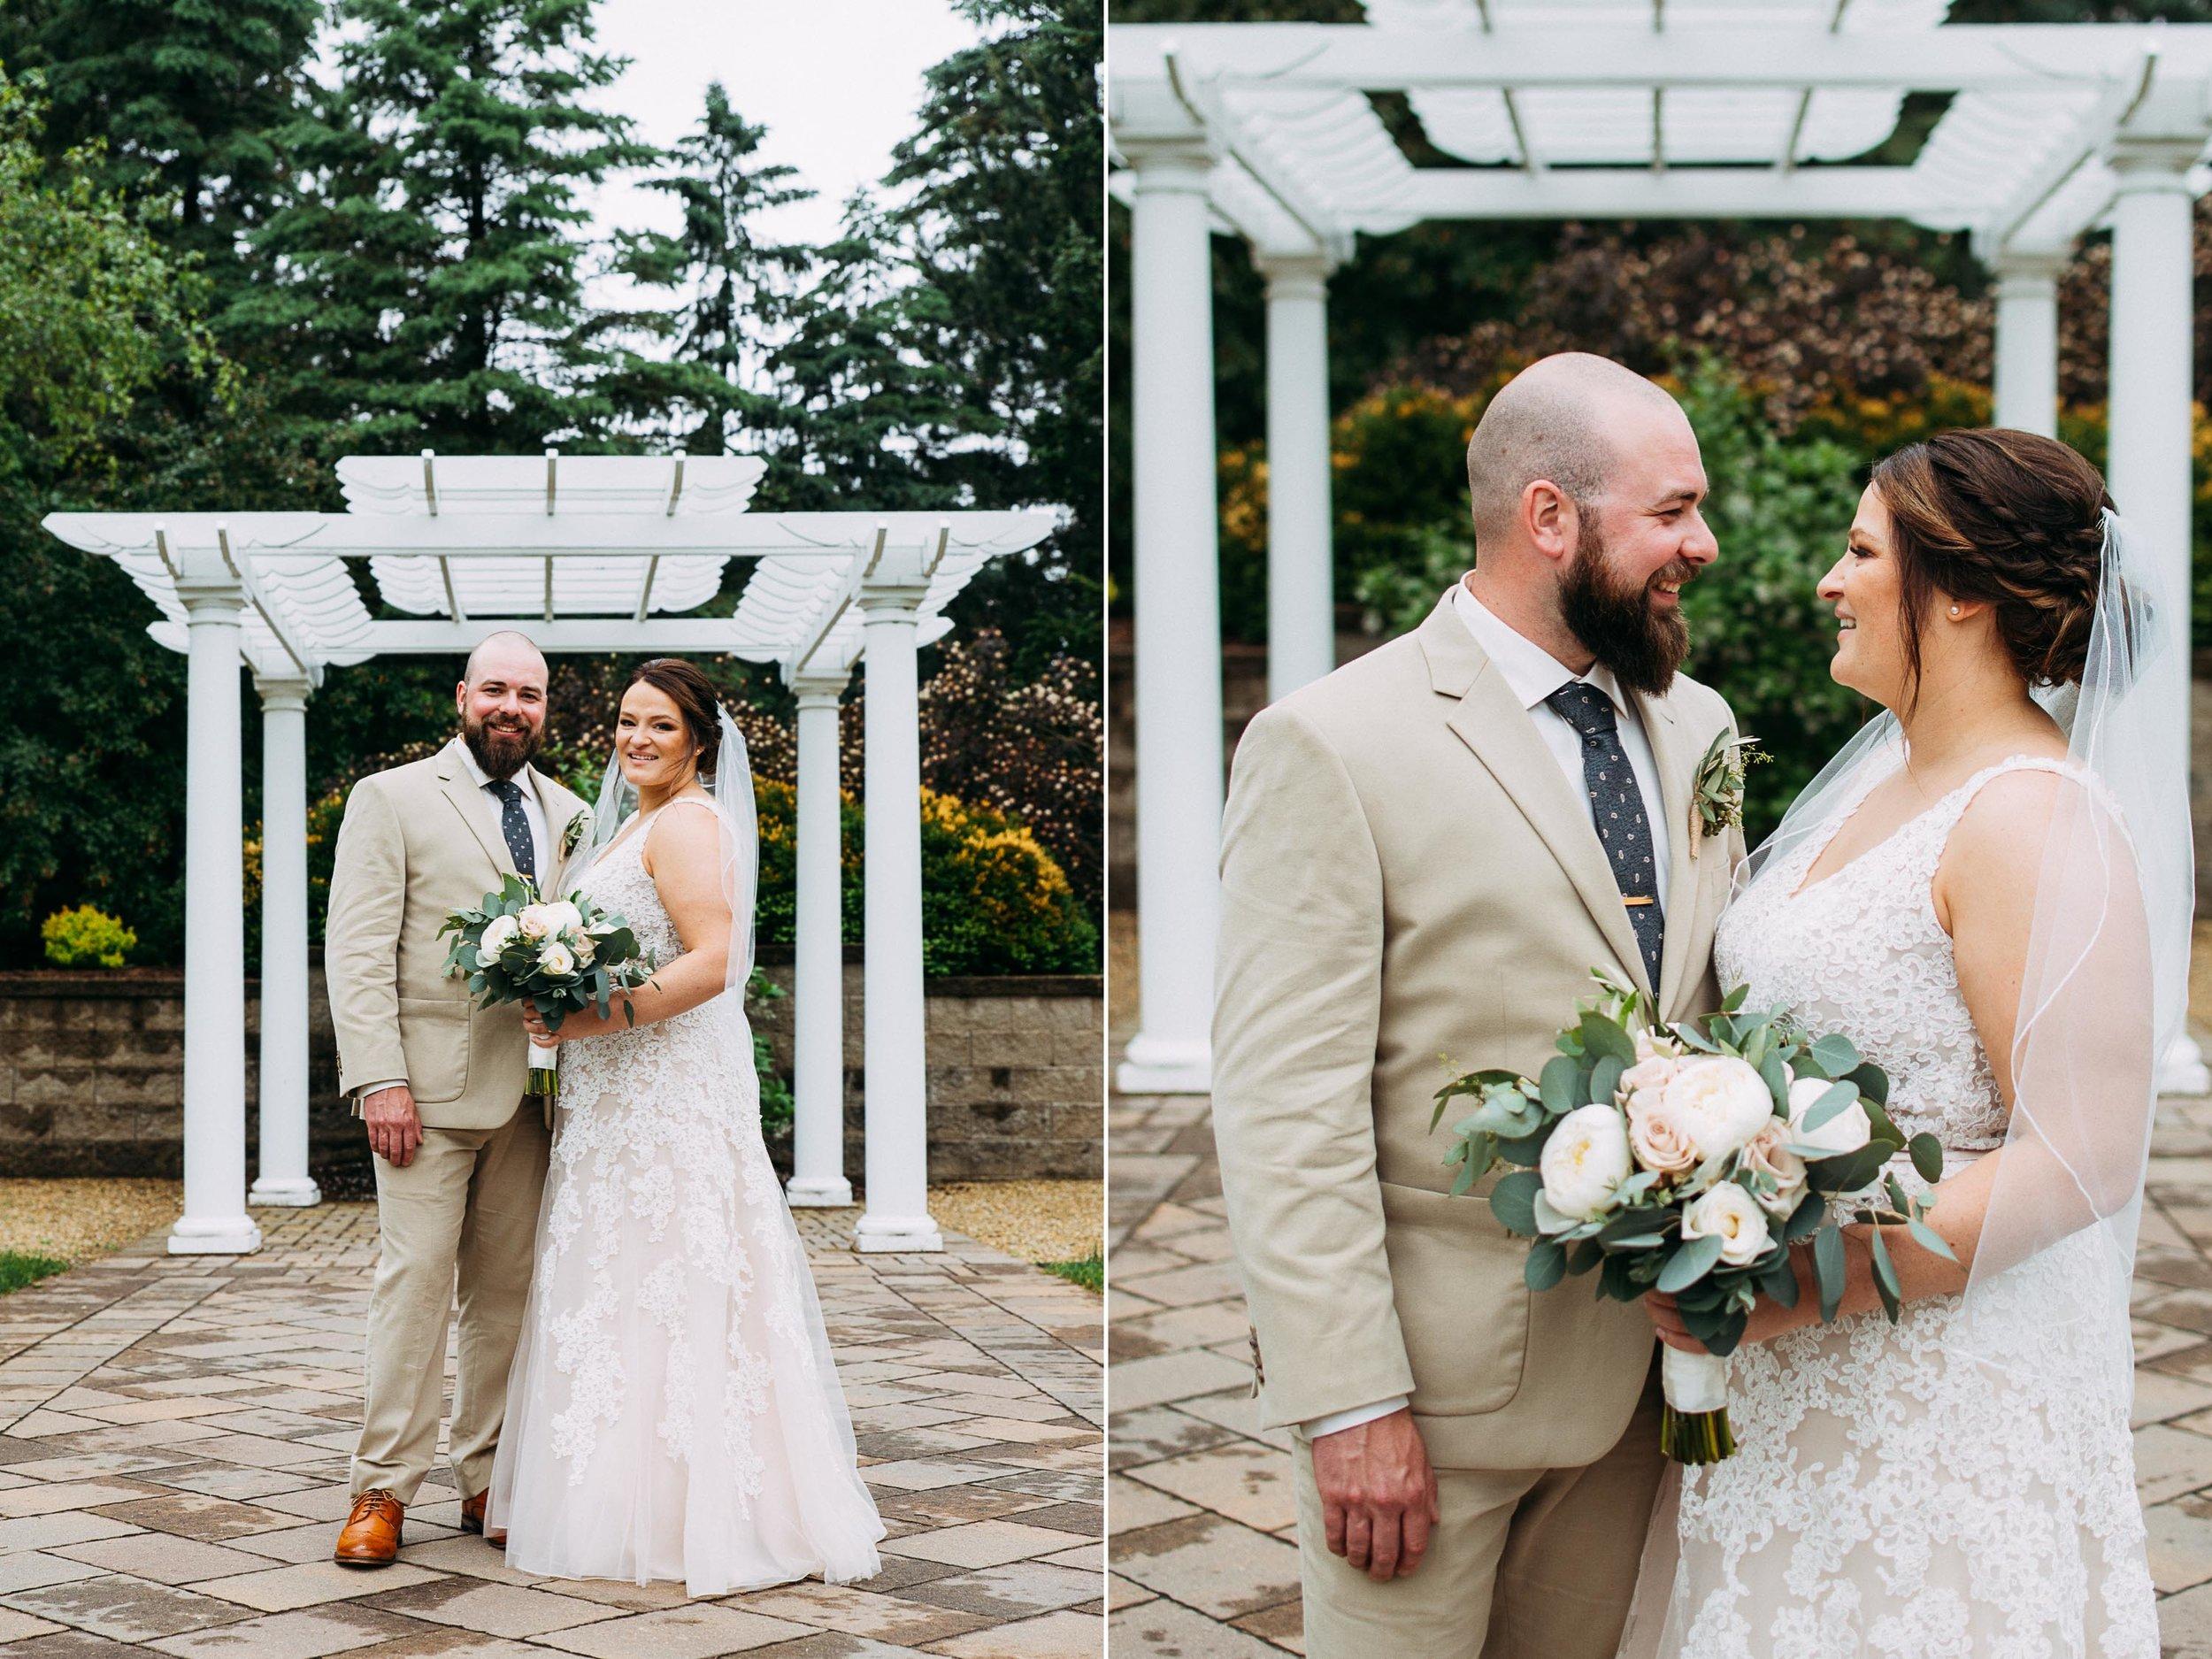 22-Jess_Jeremy_Minnesota_Wedding.jpg